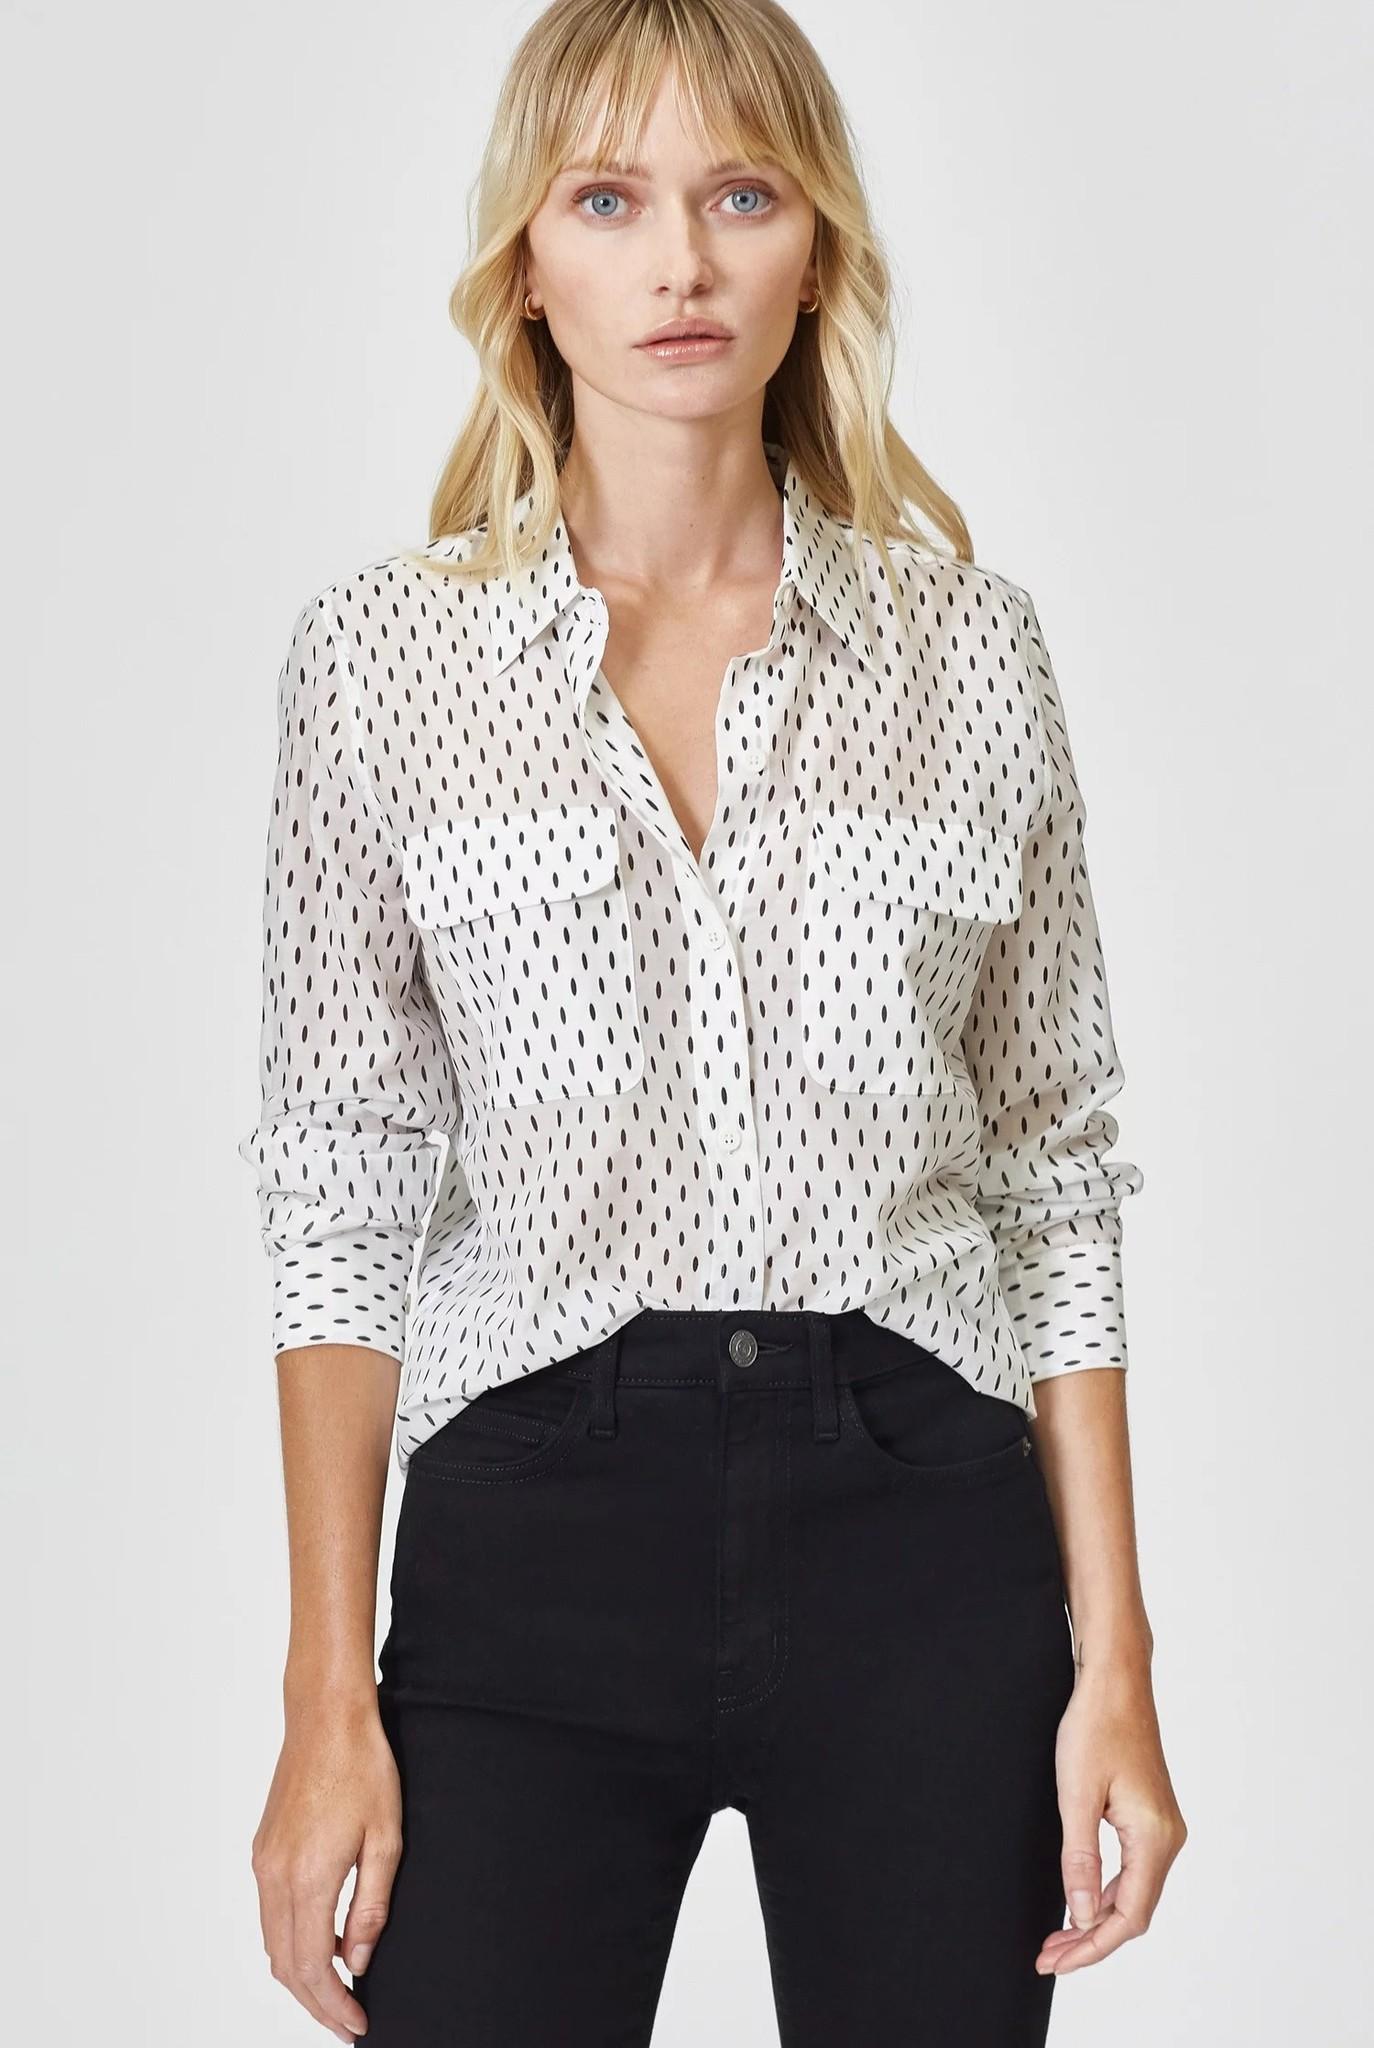 Slim signature White shirt Black drops